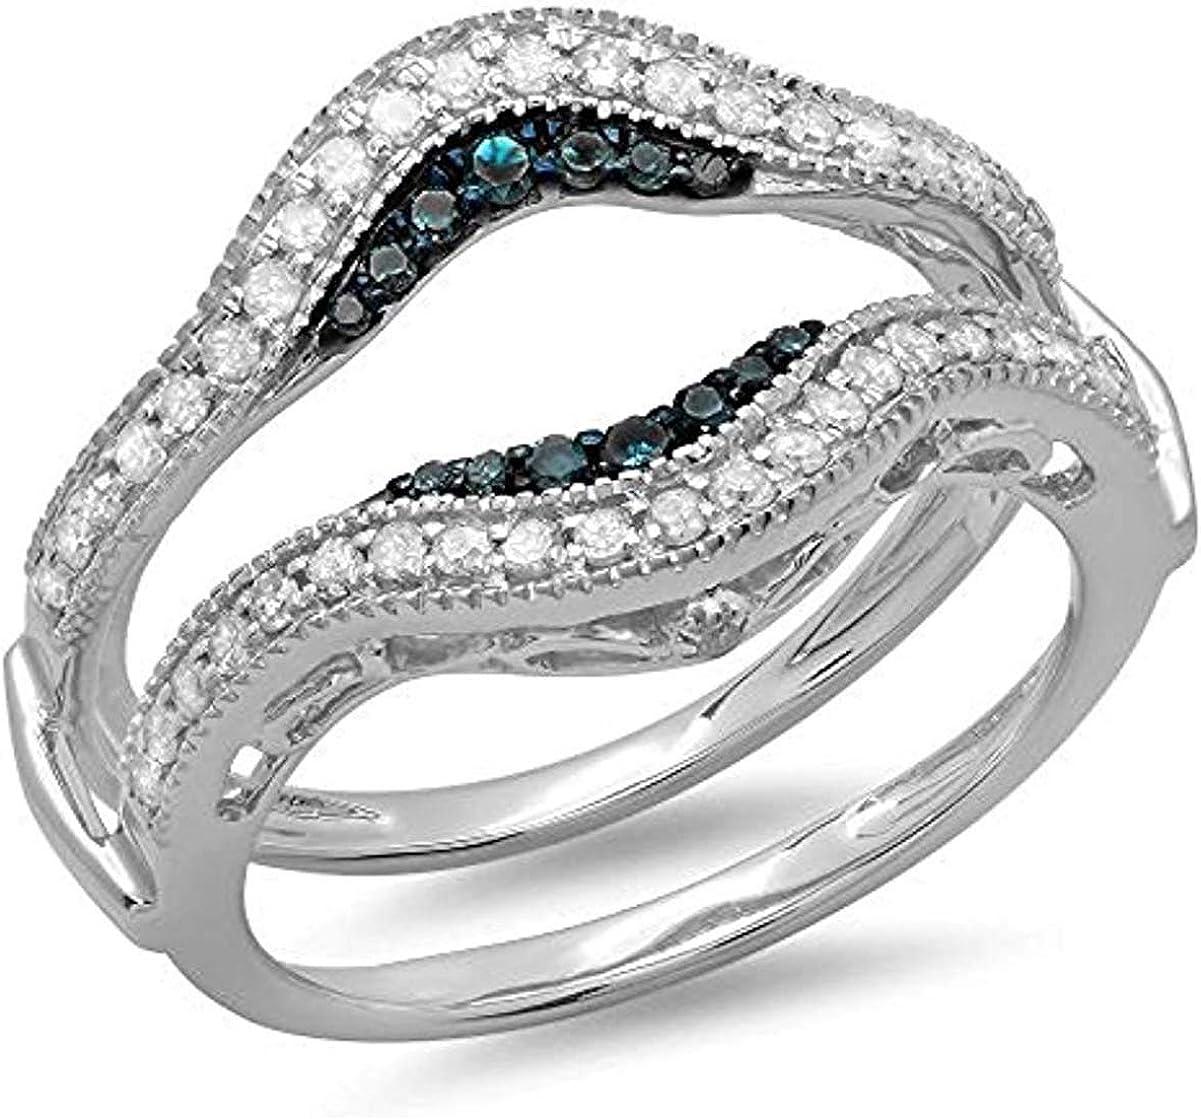 0.50 Ct Round London Blue Topaz Diamond Women's Engagement Wedding Milgrain Enhancer Ring Guard 925 Sterling Silver